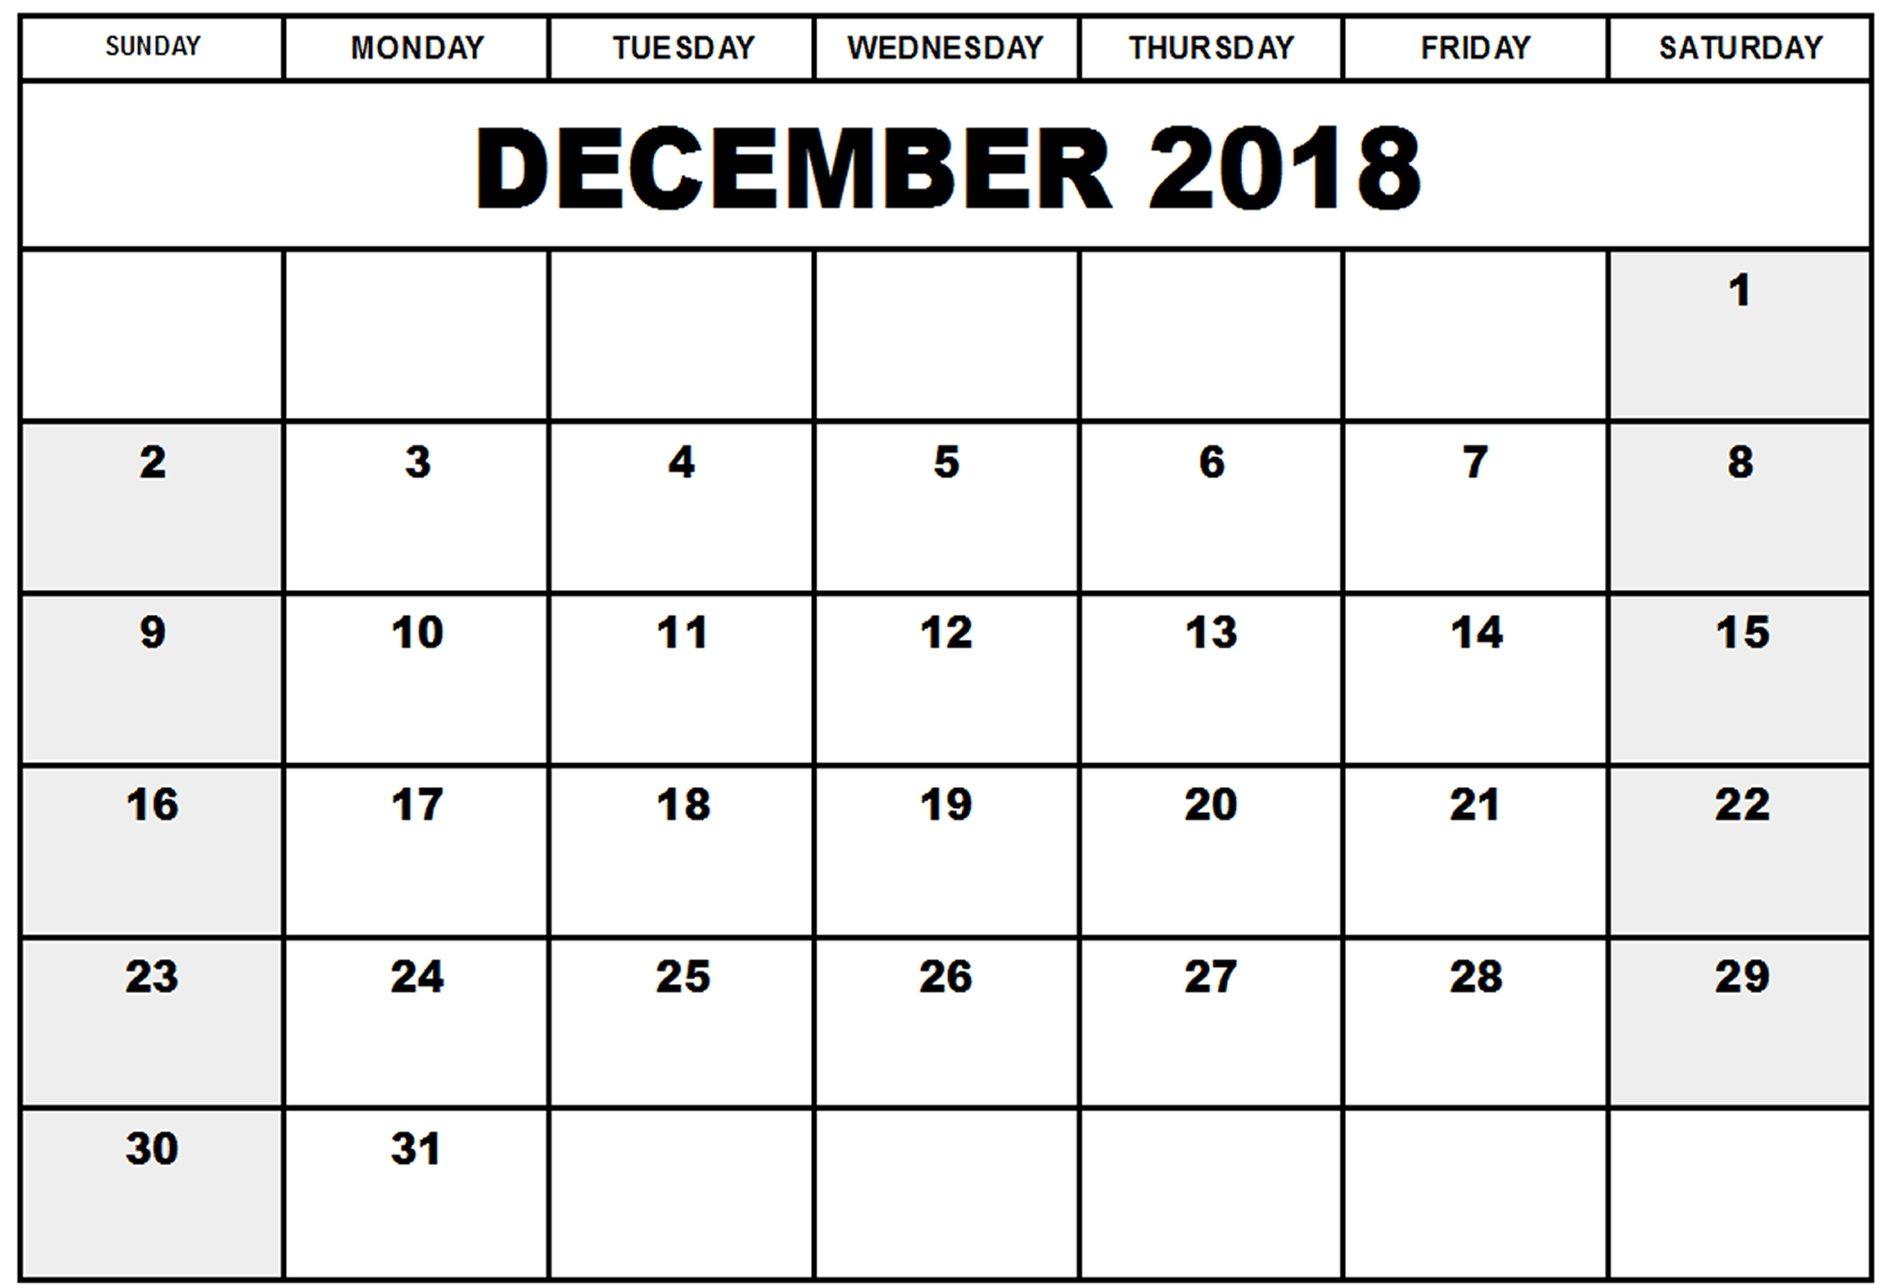 December 2018 Landscape Calendar